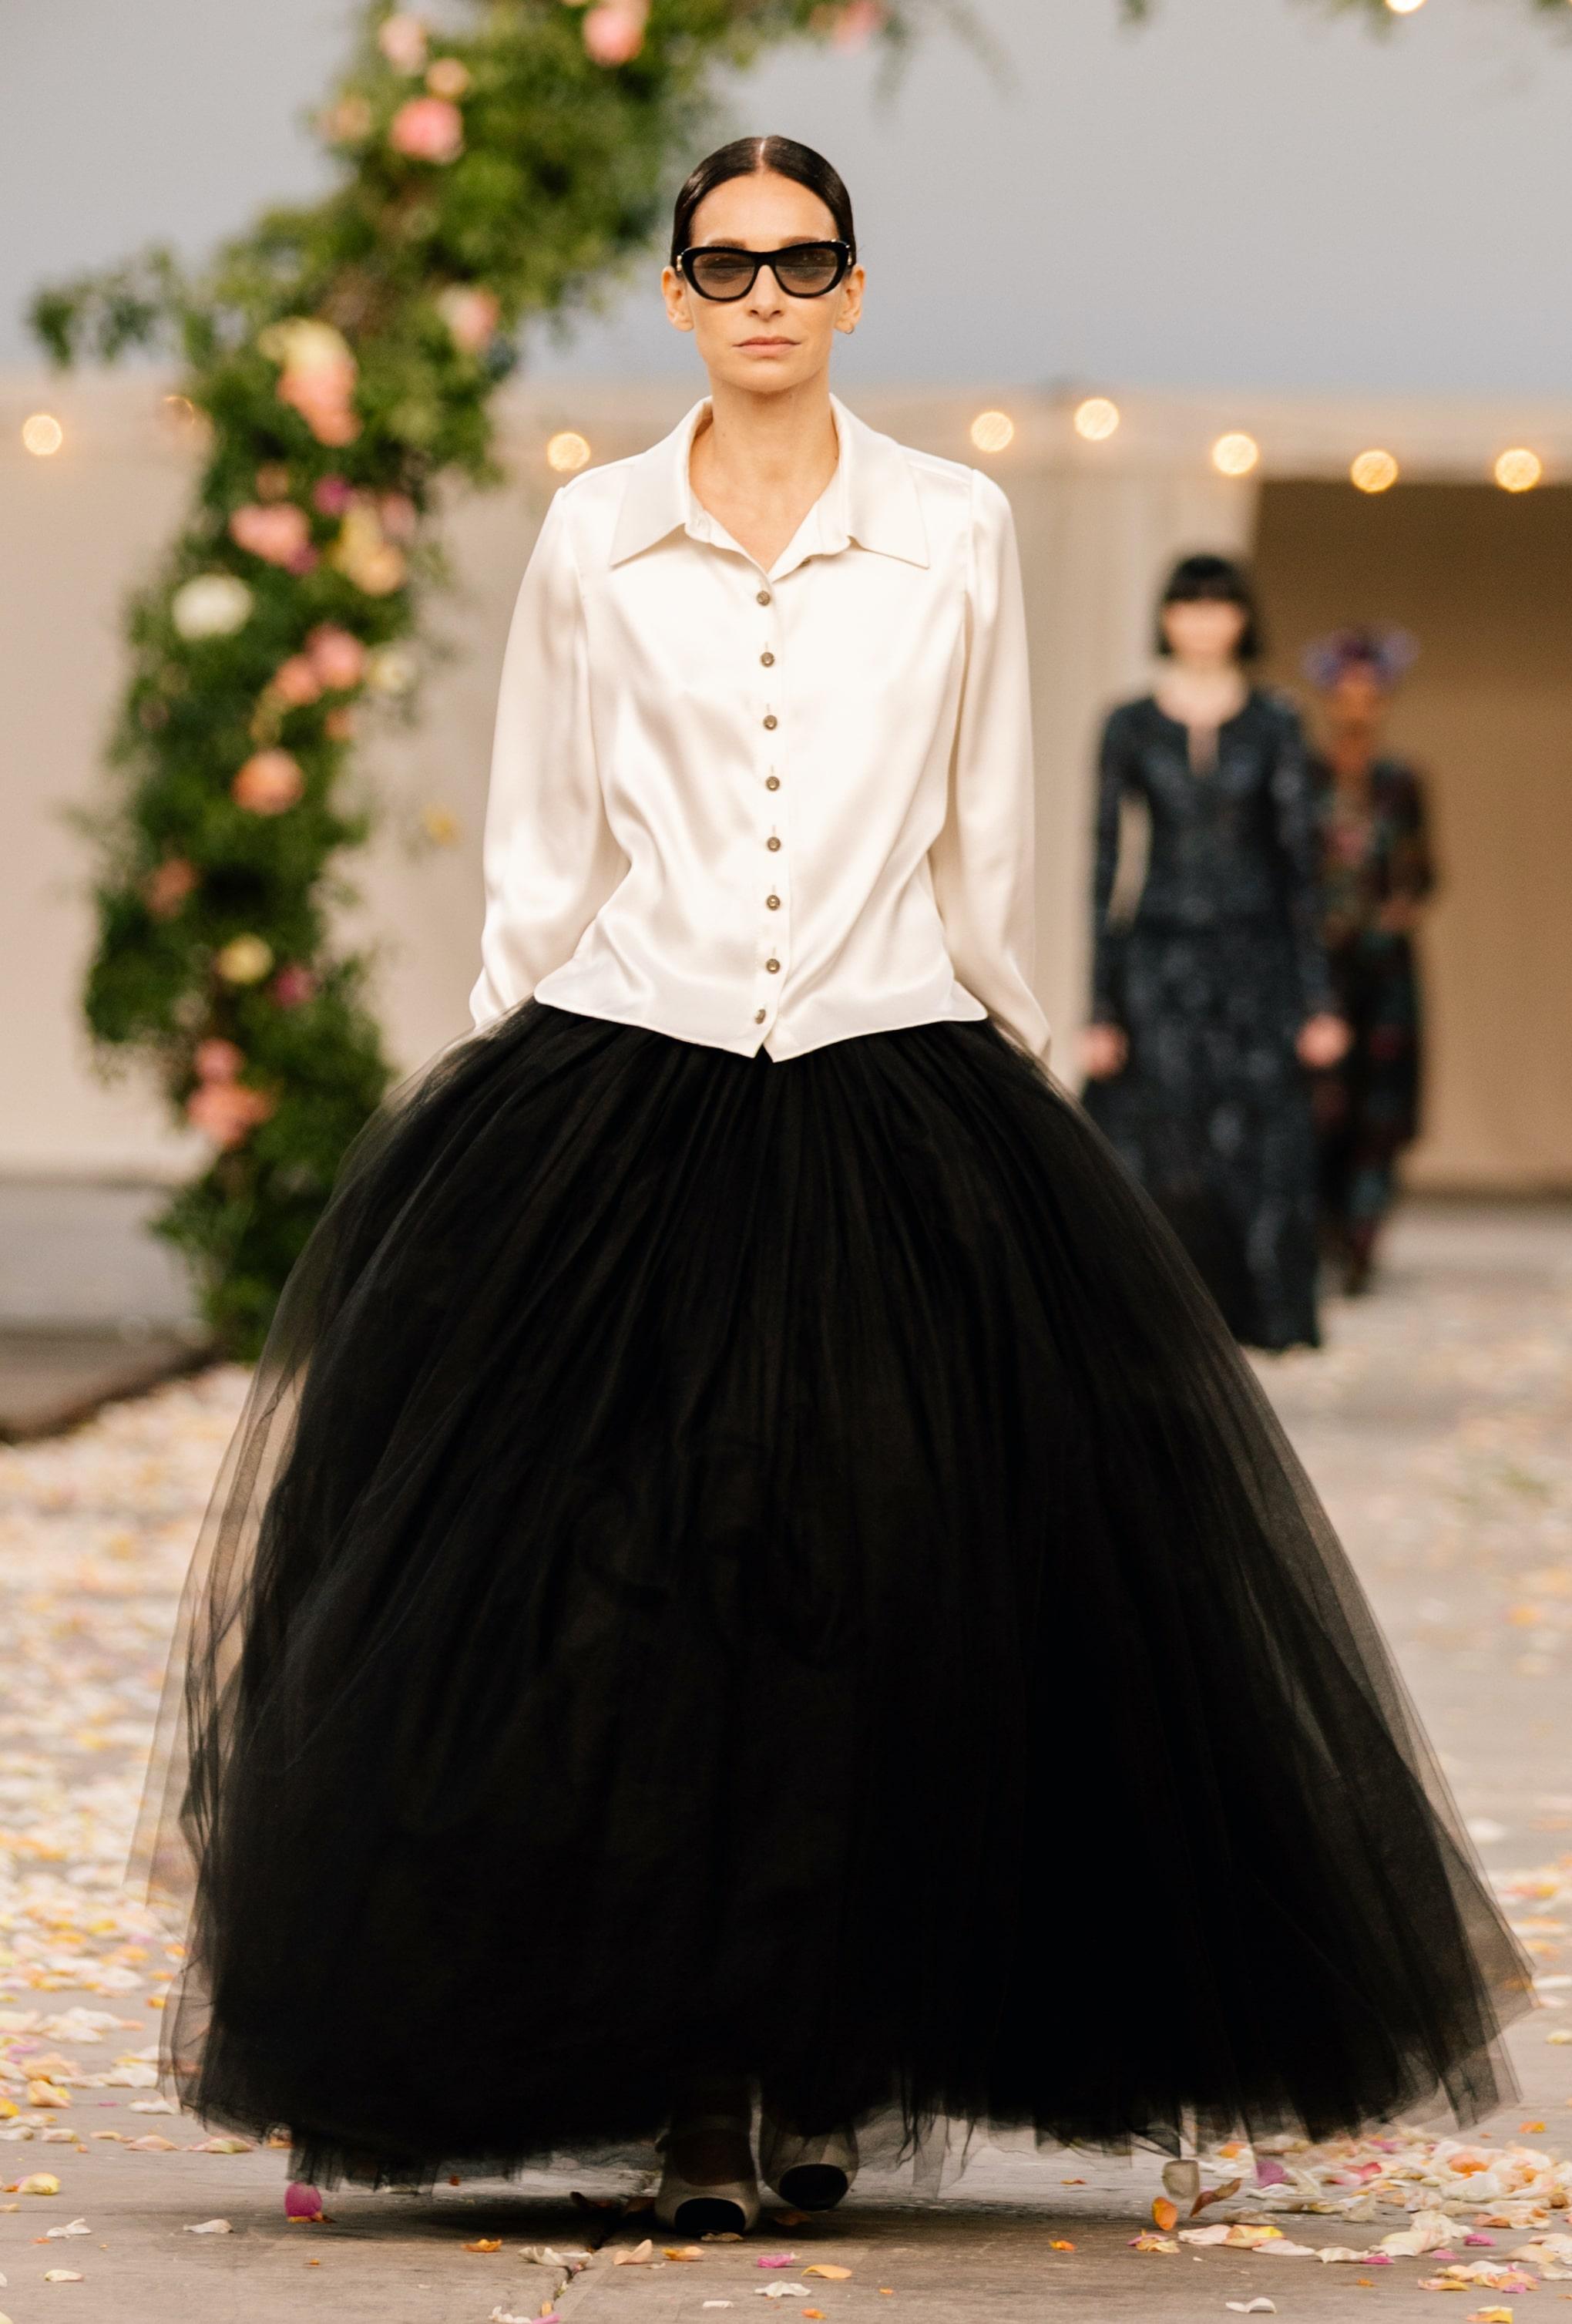 Chanel celebra a la Alta Costura con su colección primavera-verano 2021